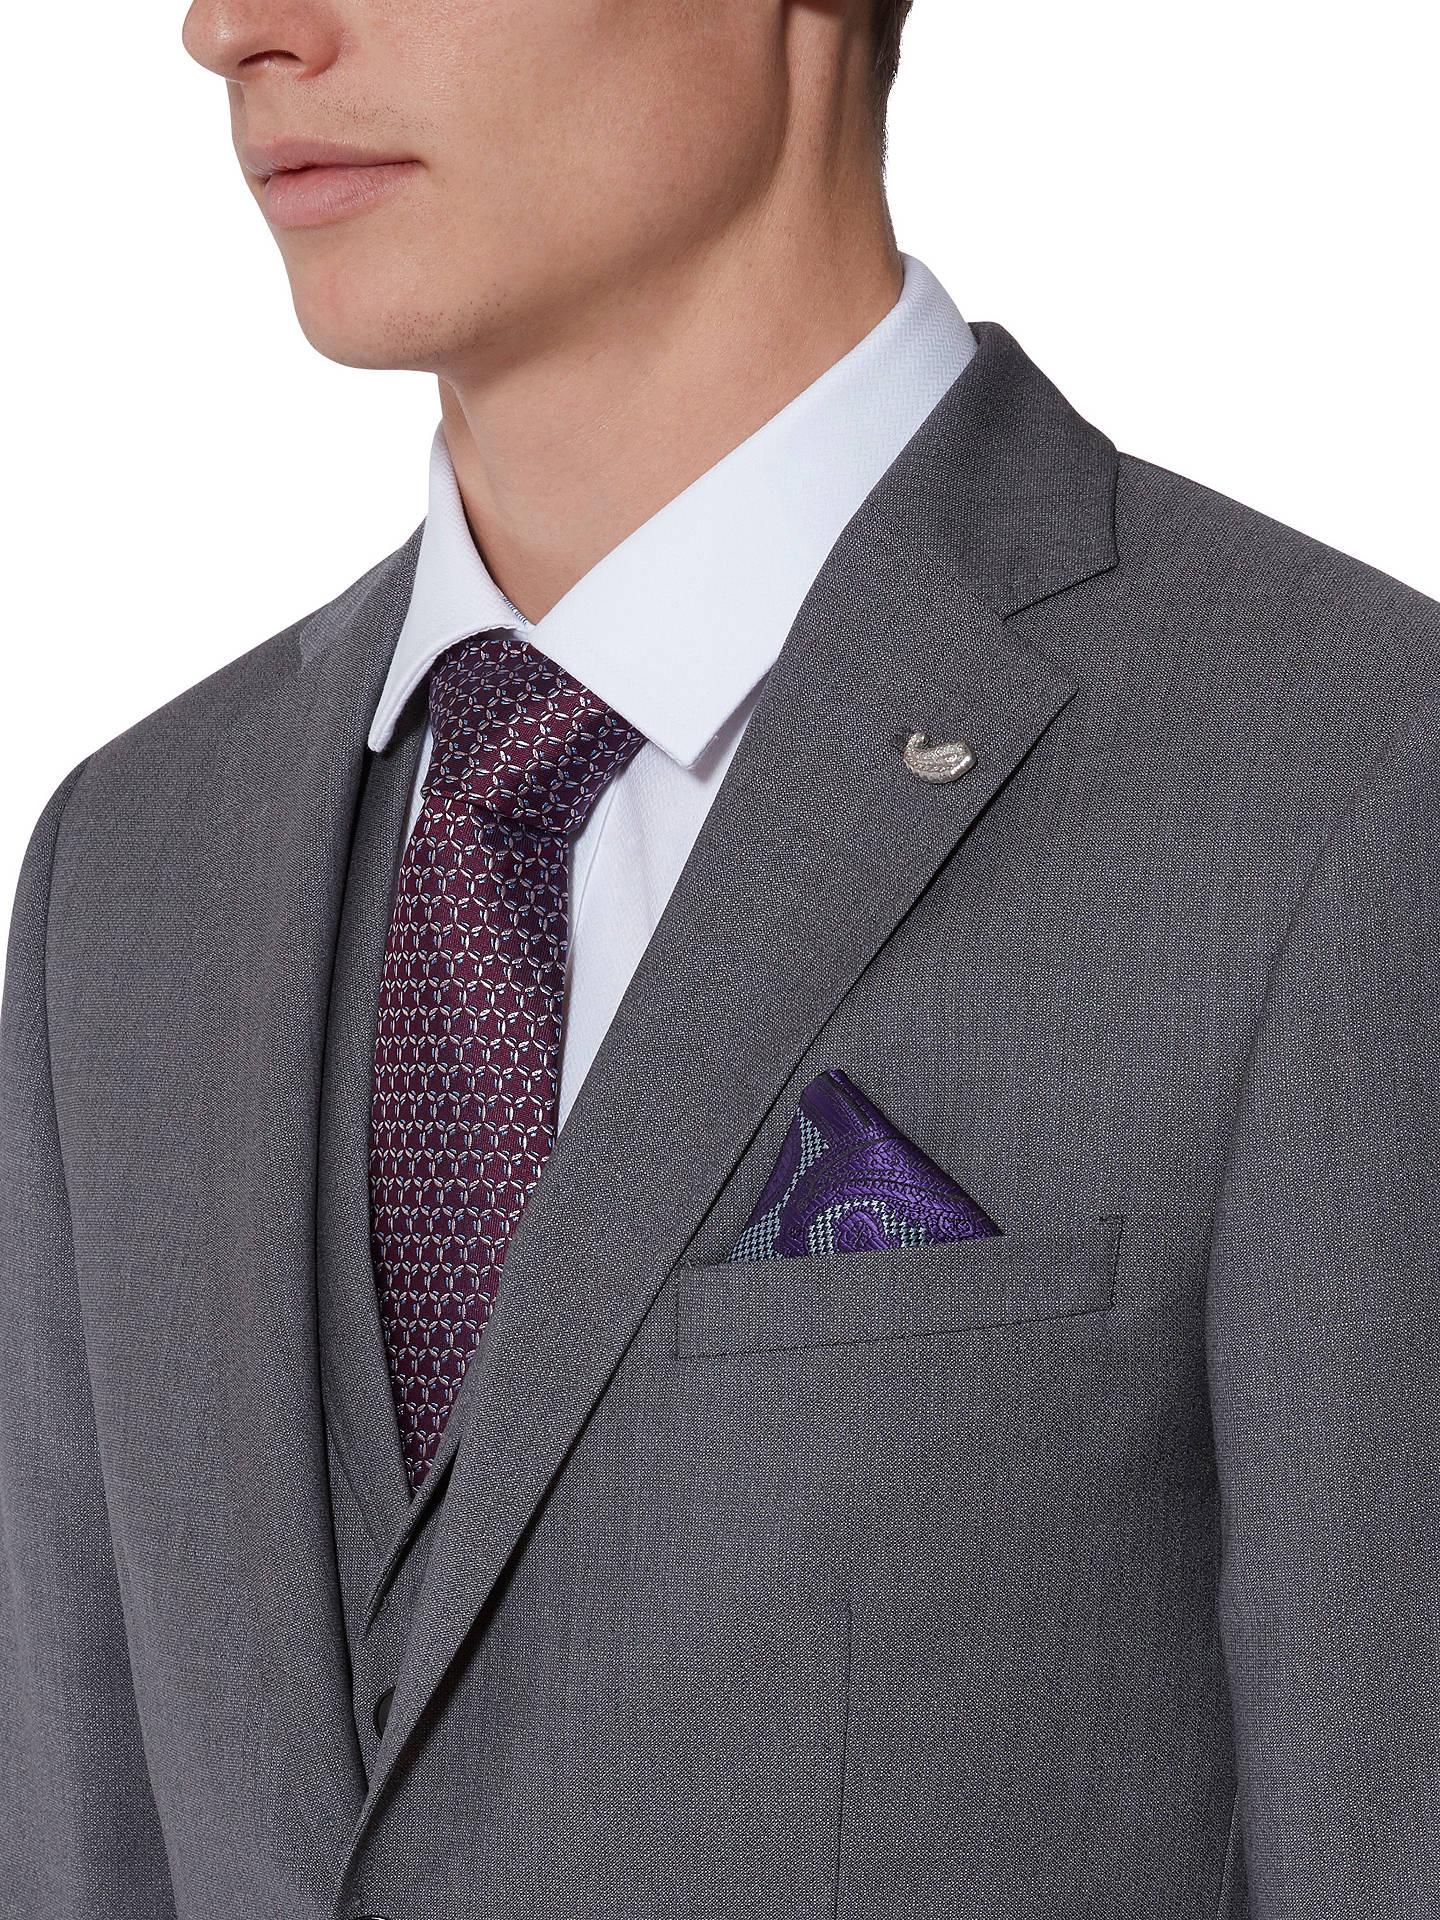 776e5a609c00 ... Buy Ted Baker Bundaj Wool Semi Plain Tailored Suit Jacket